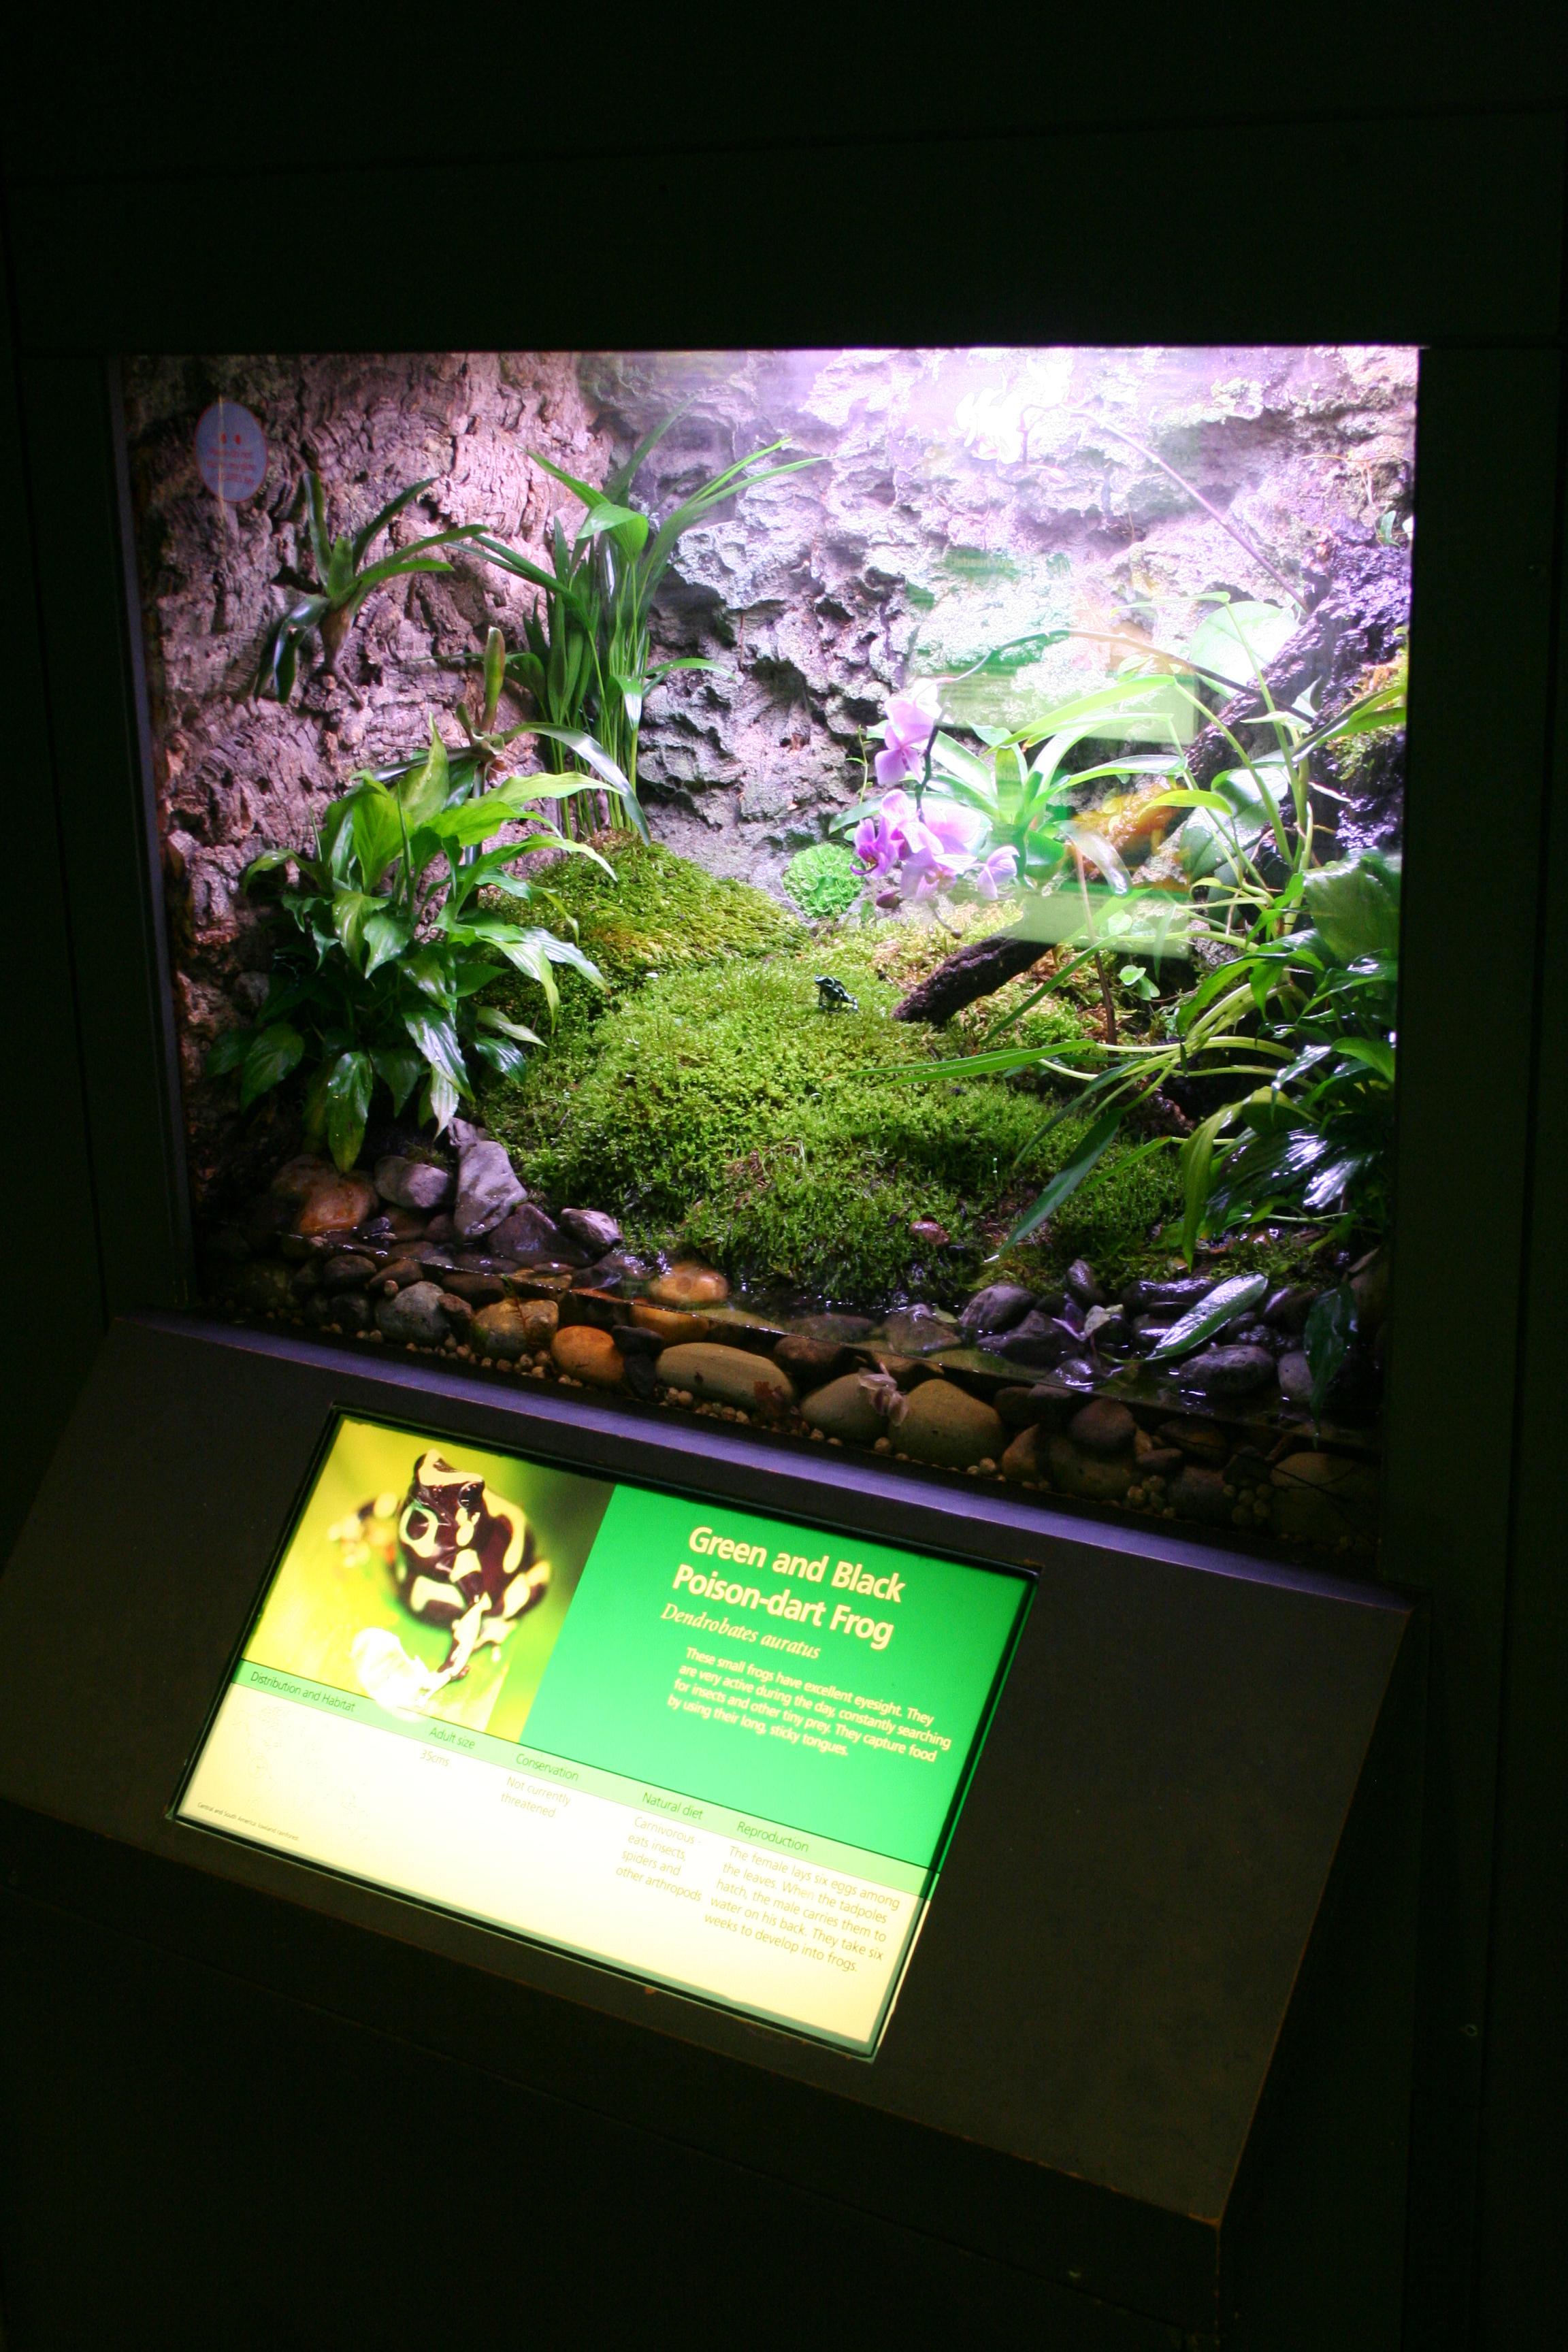 New Poison-dart Frog Exhibit! | FROG BLOG MANCHESTER